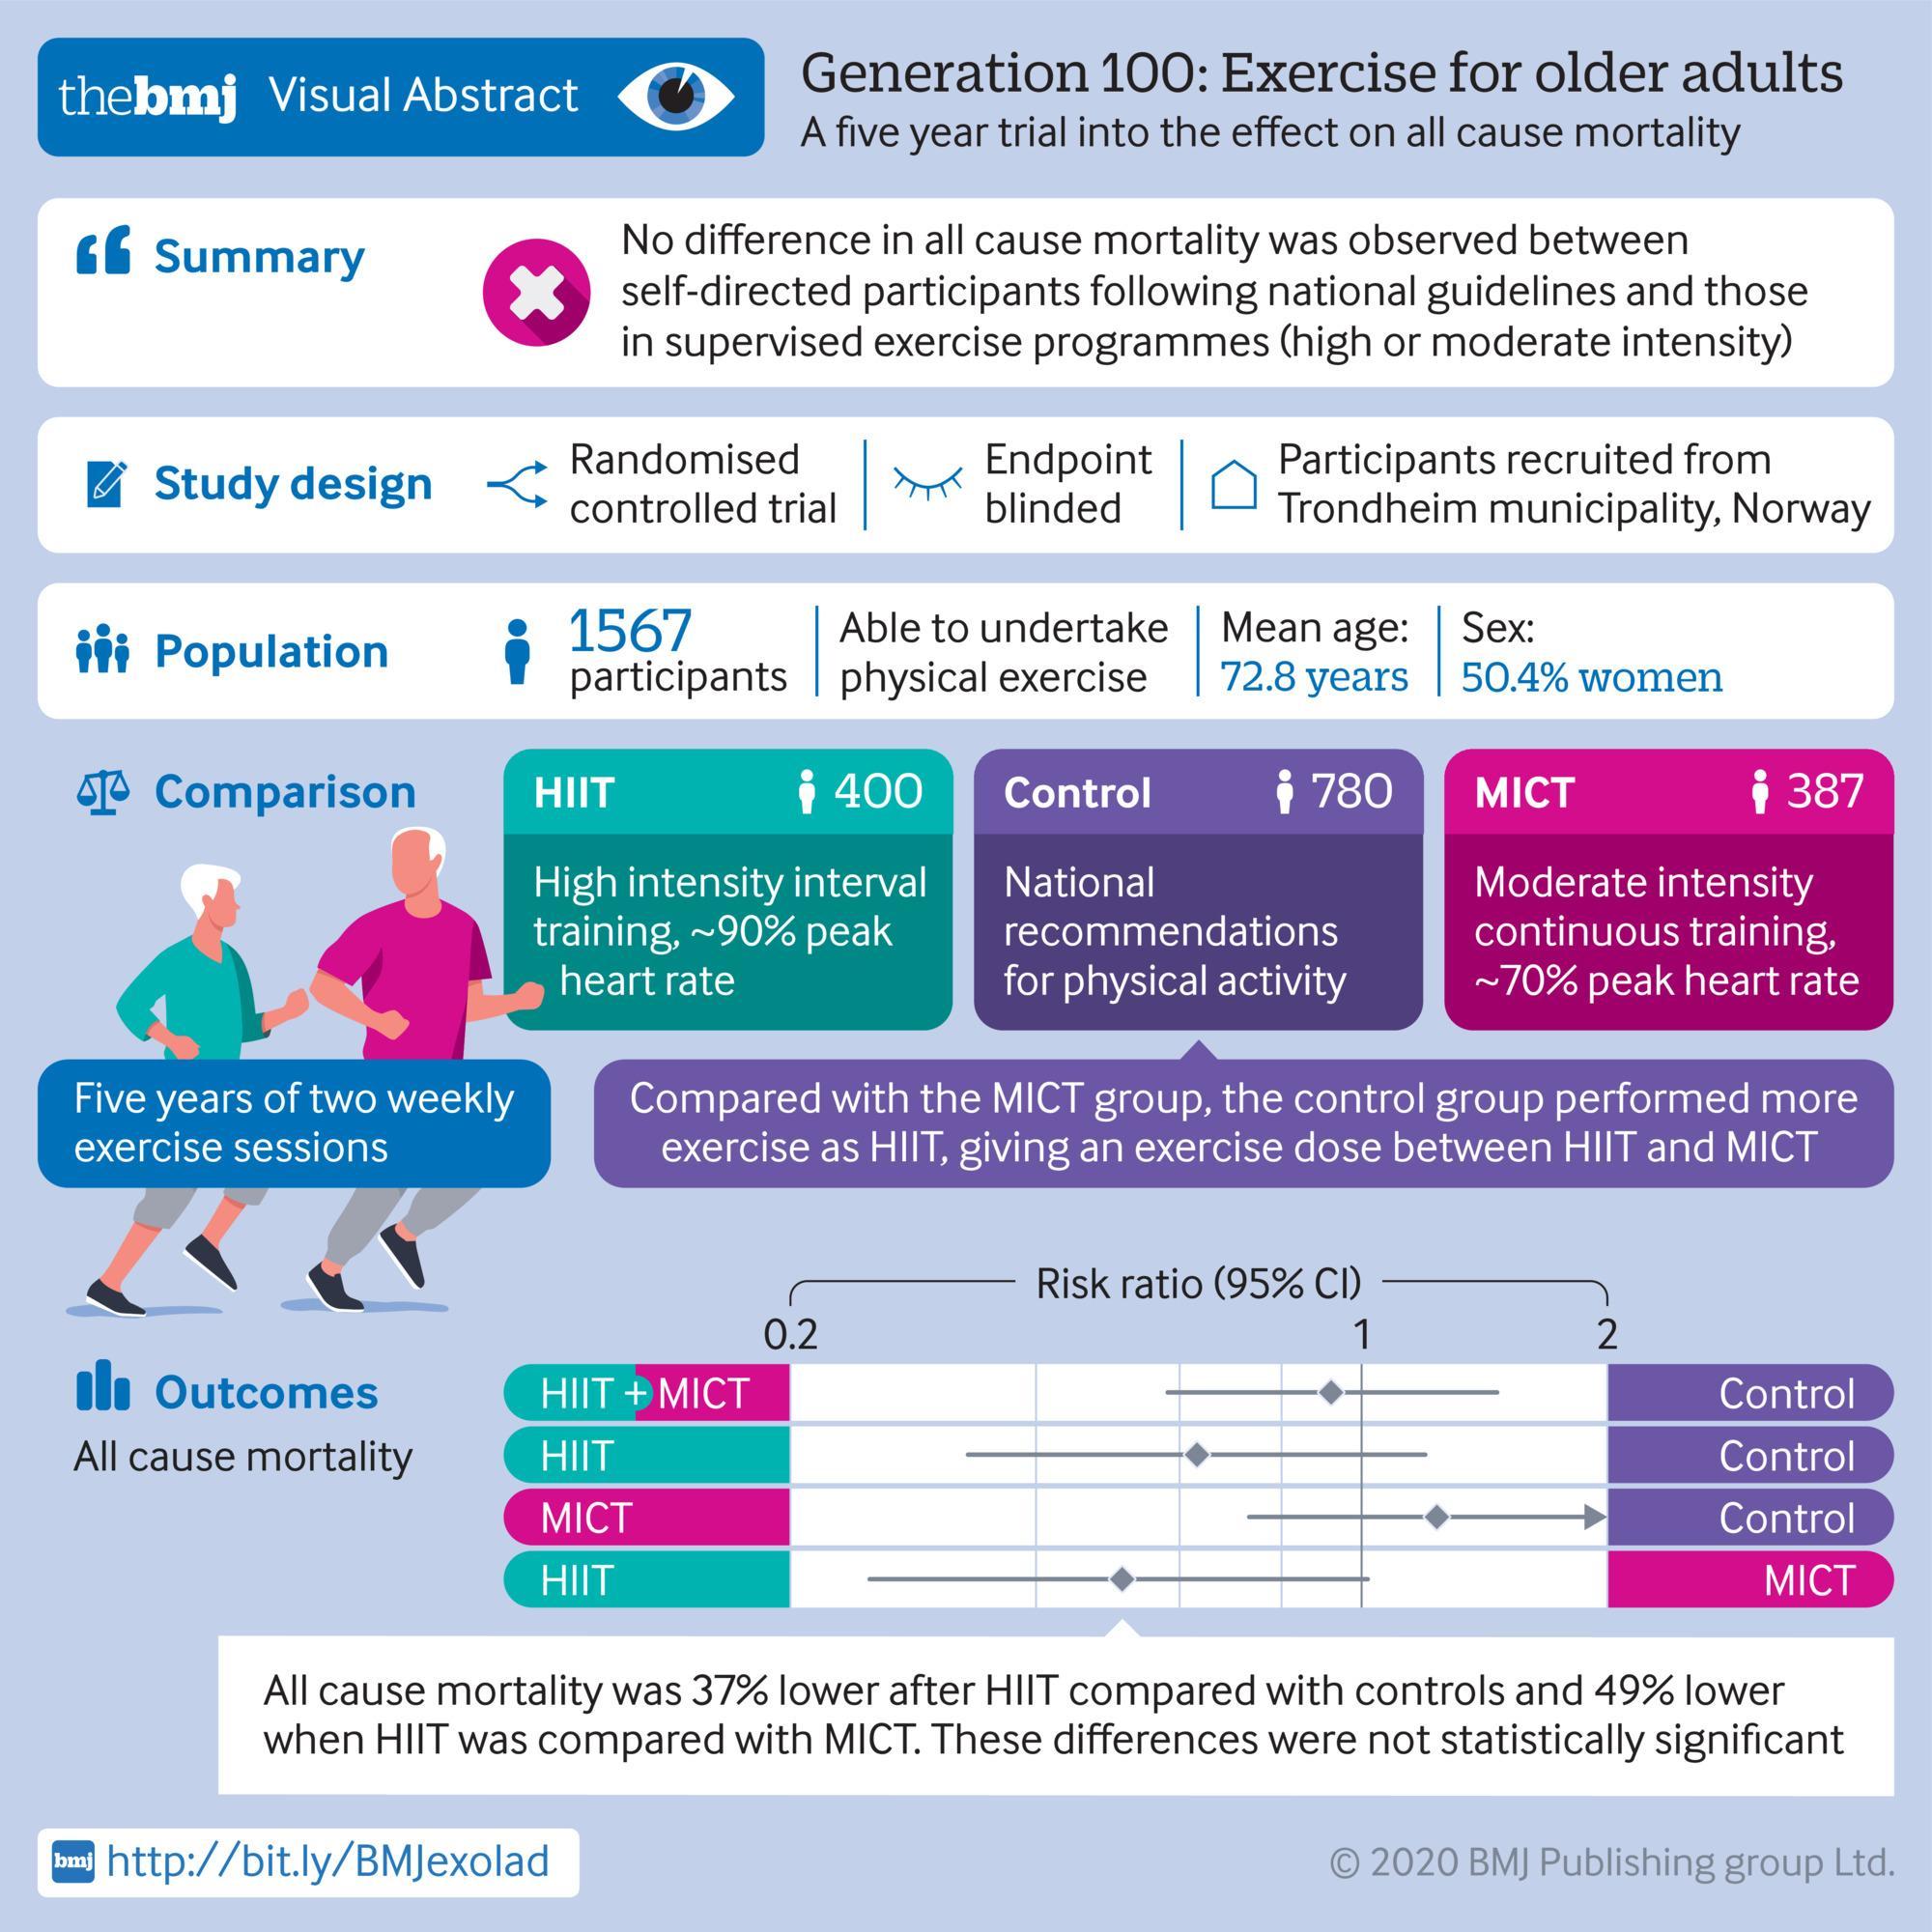 [BMJ发表论文]:身体锻炼5年对老年人全因死亡率的影响